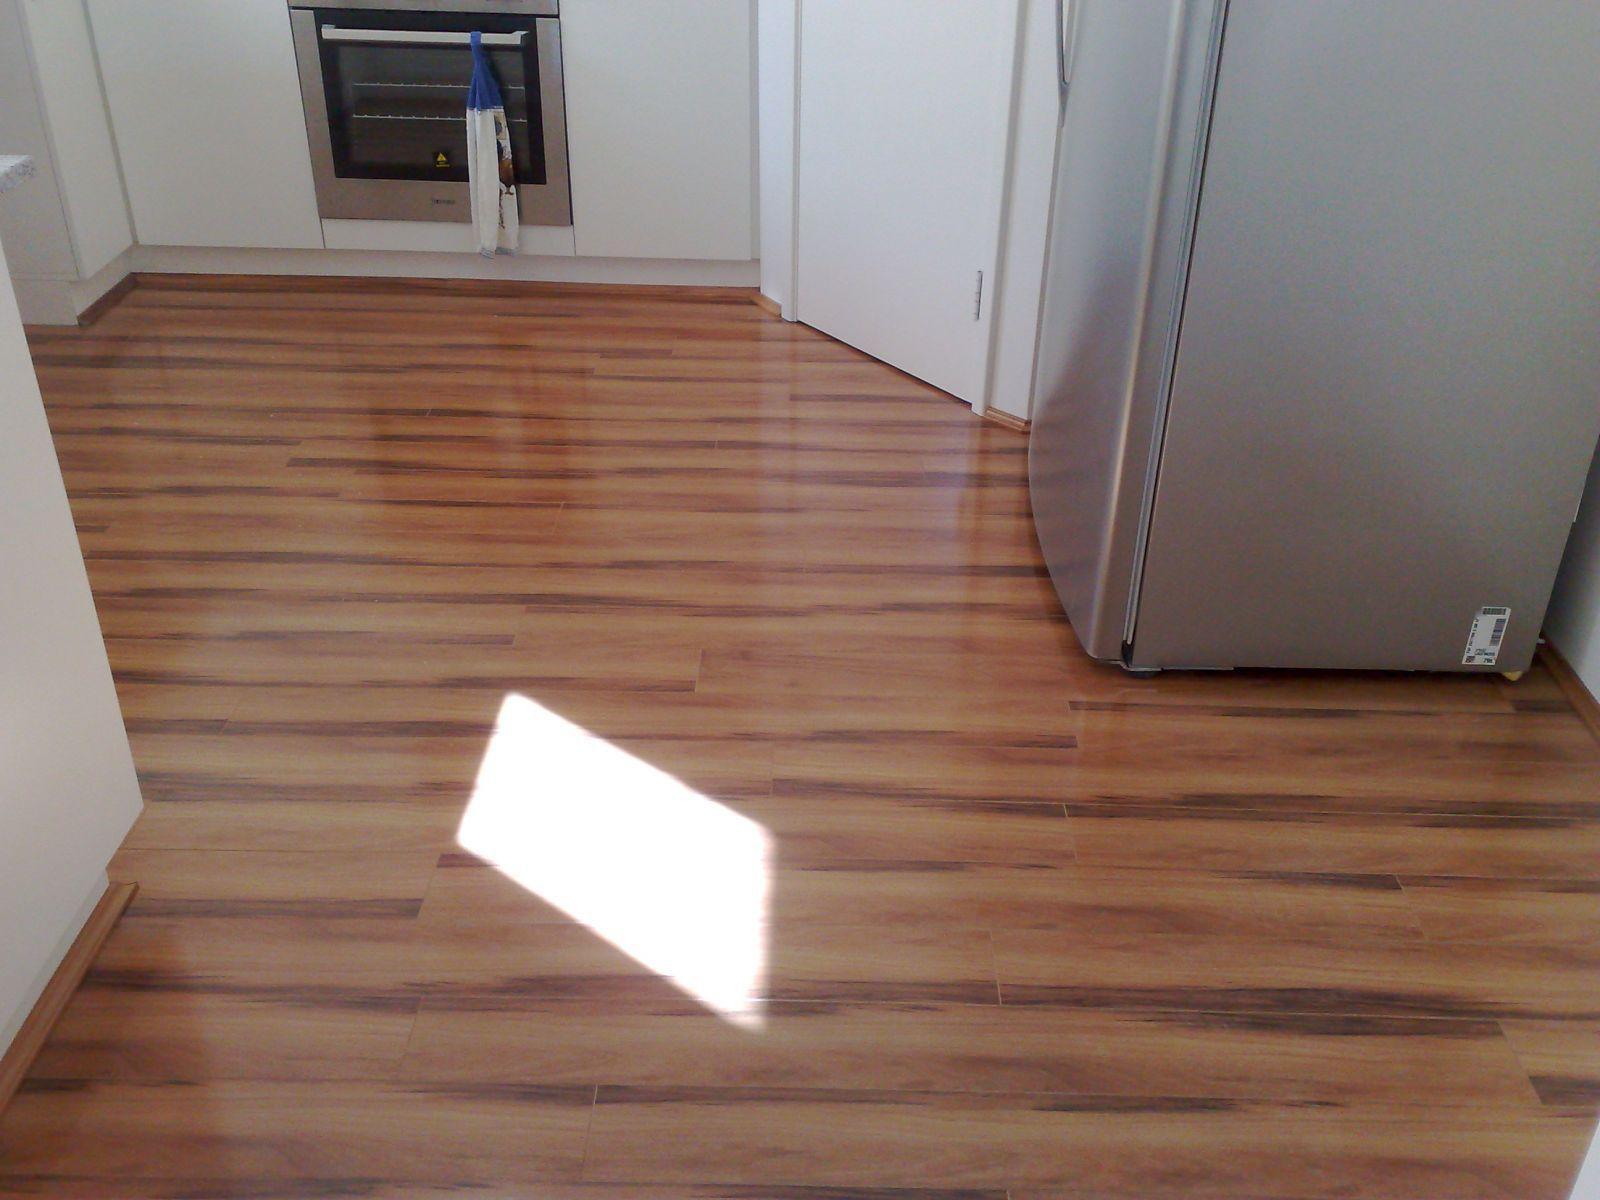 Blackbutt Flooring is the best quality flooring made of